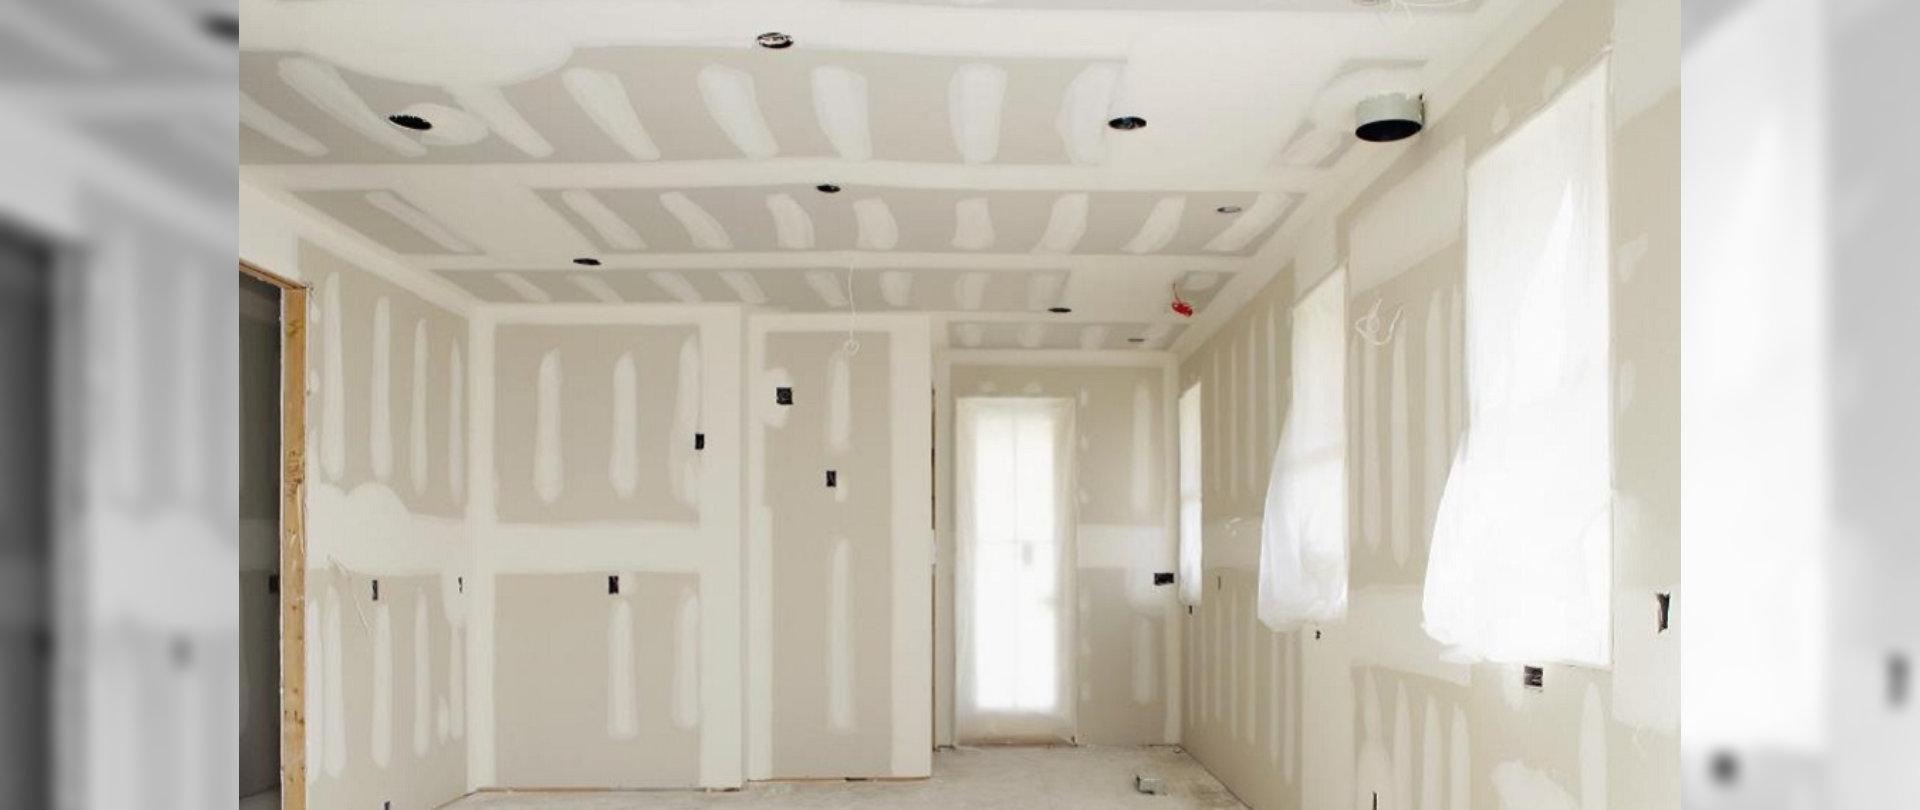 ongoing renovation